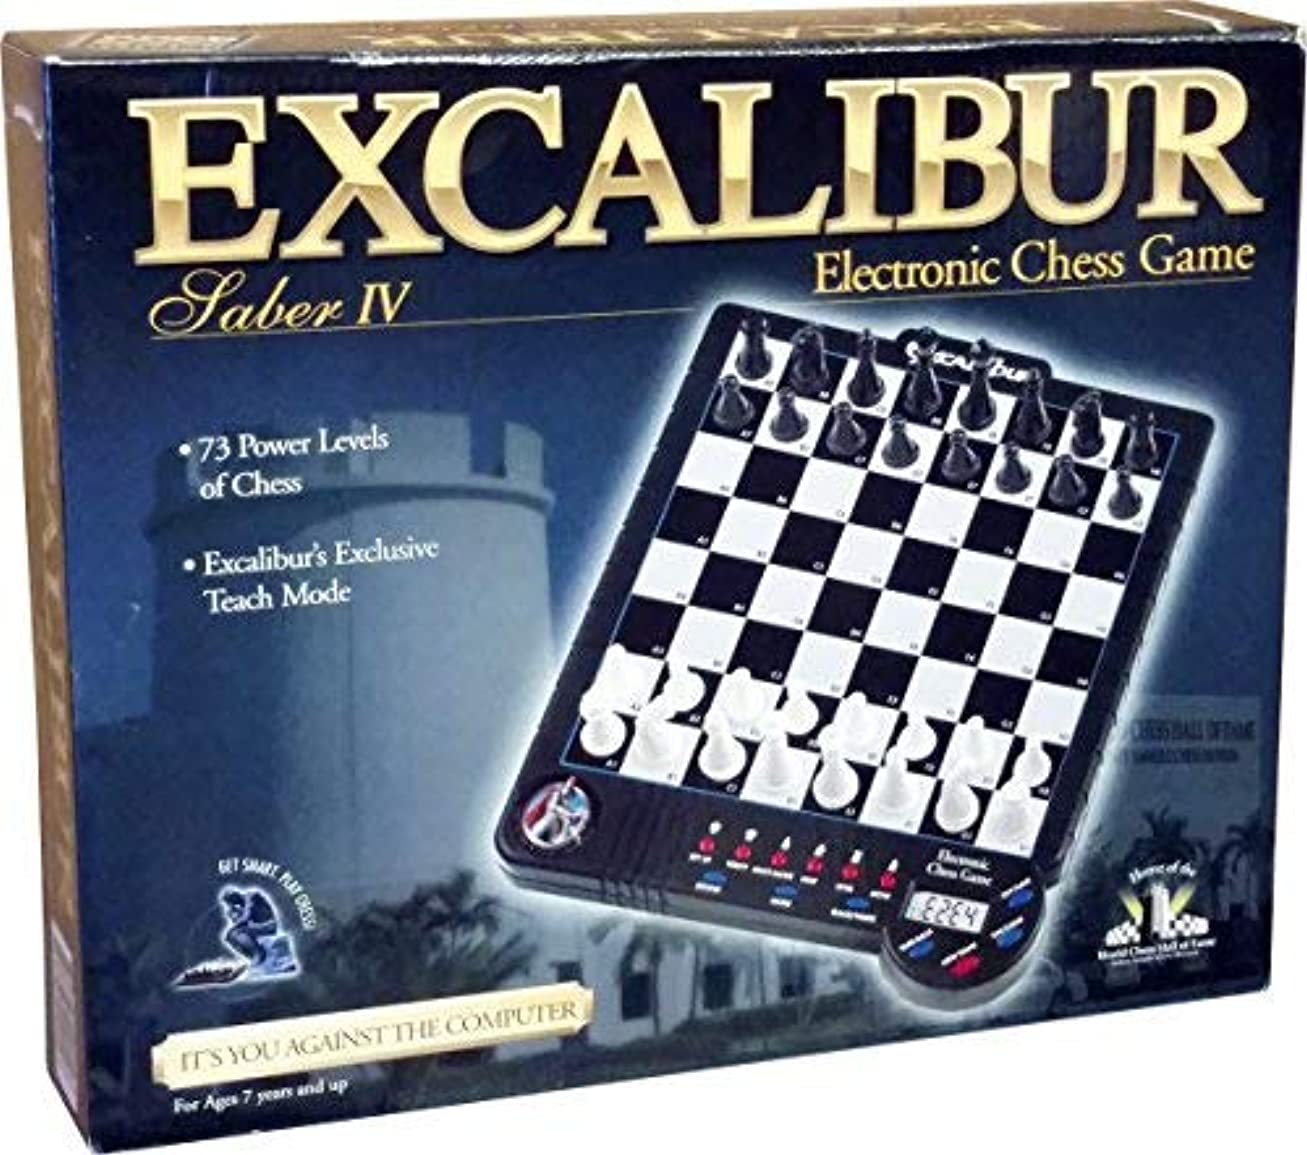 Excalibur Electronic Saber 4 Electronic Chess Game [並行輸入品]